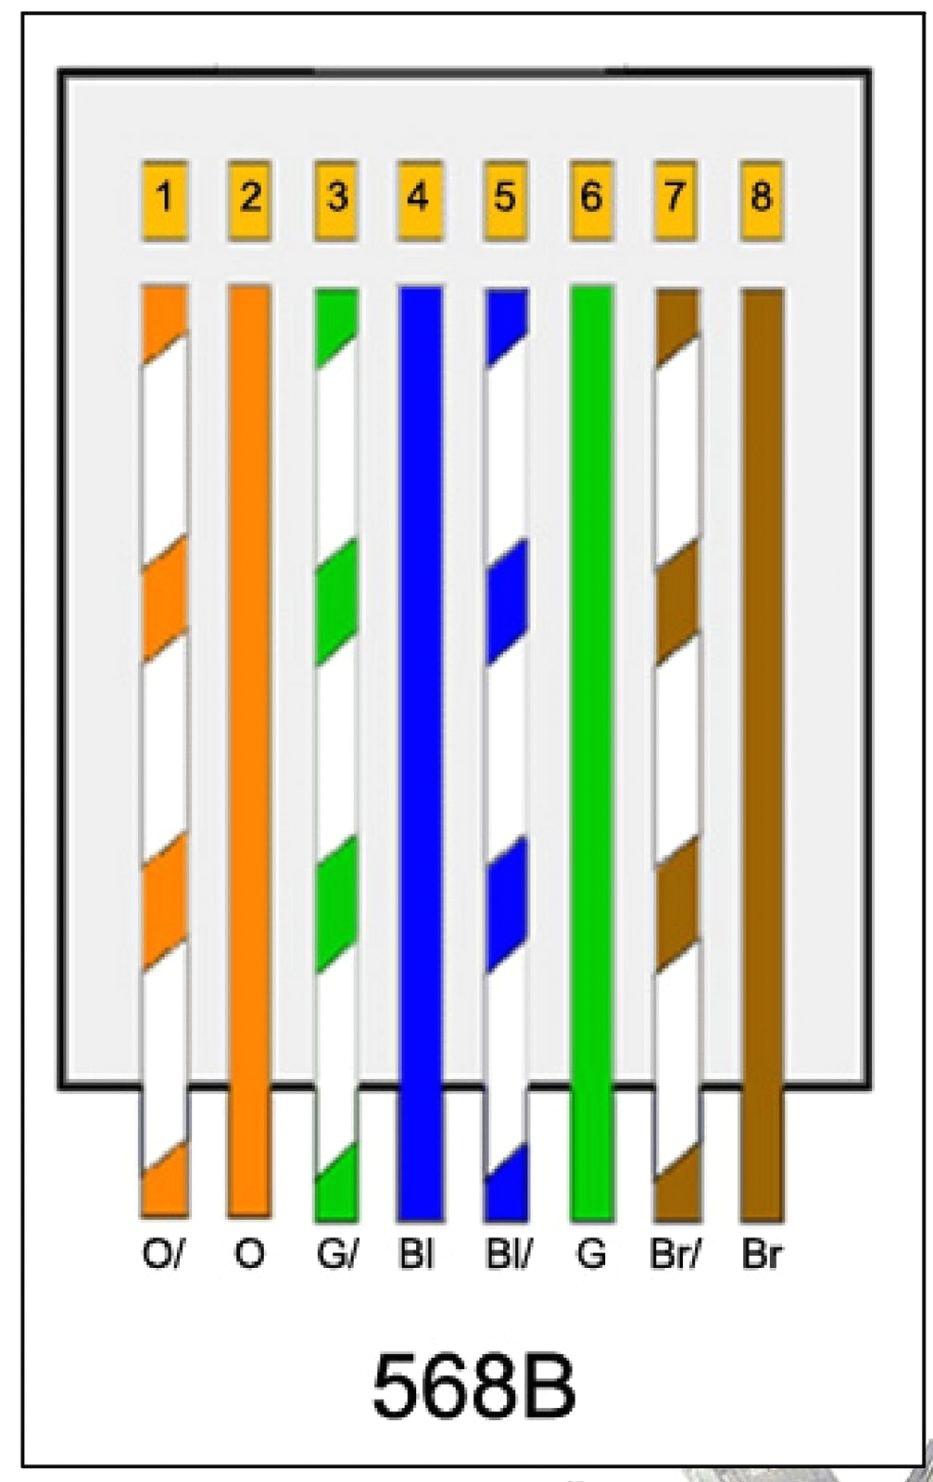 B Wiring Diagram - Great Installation Of Wiring Diagram • - Cat5 B Wiring Diagram